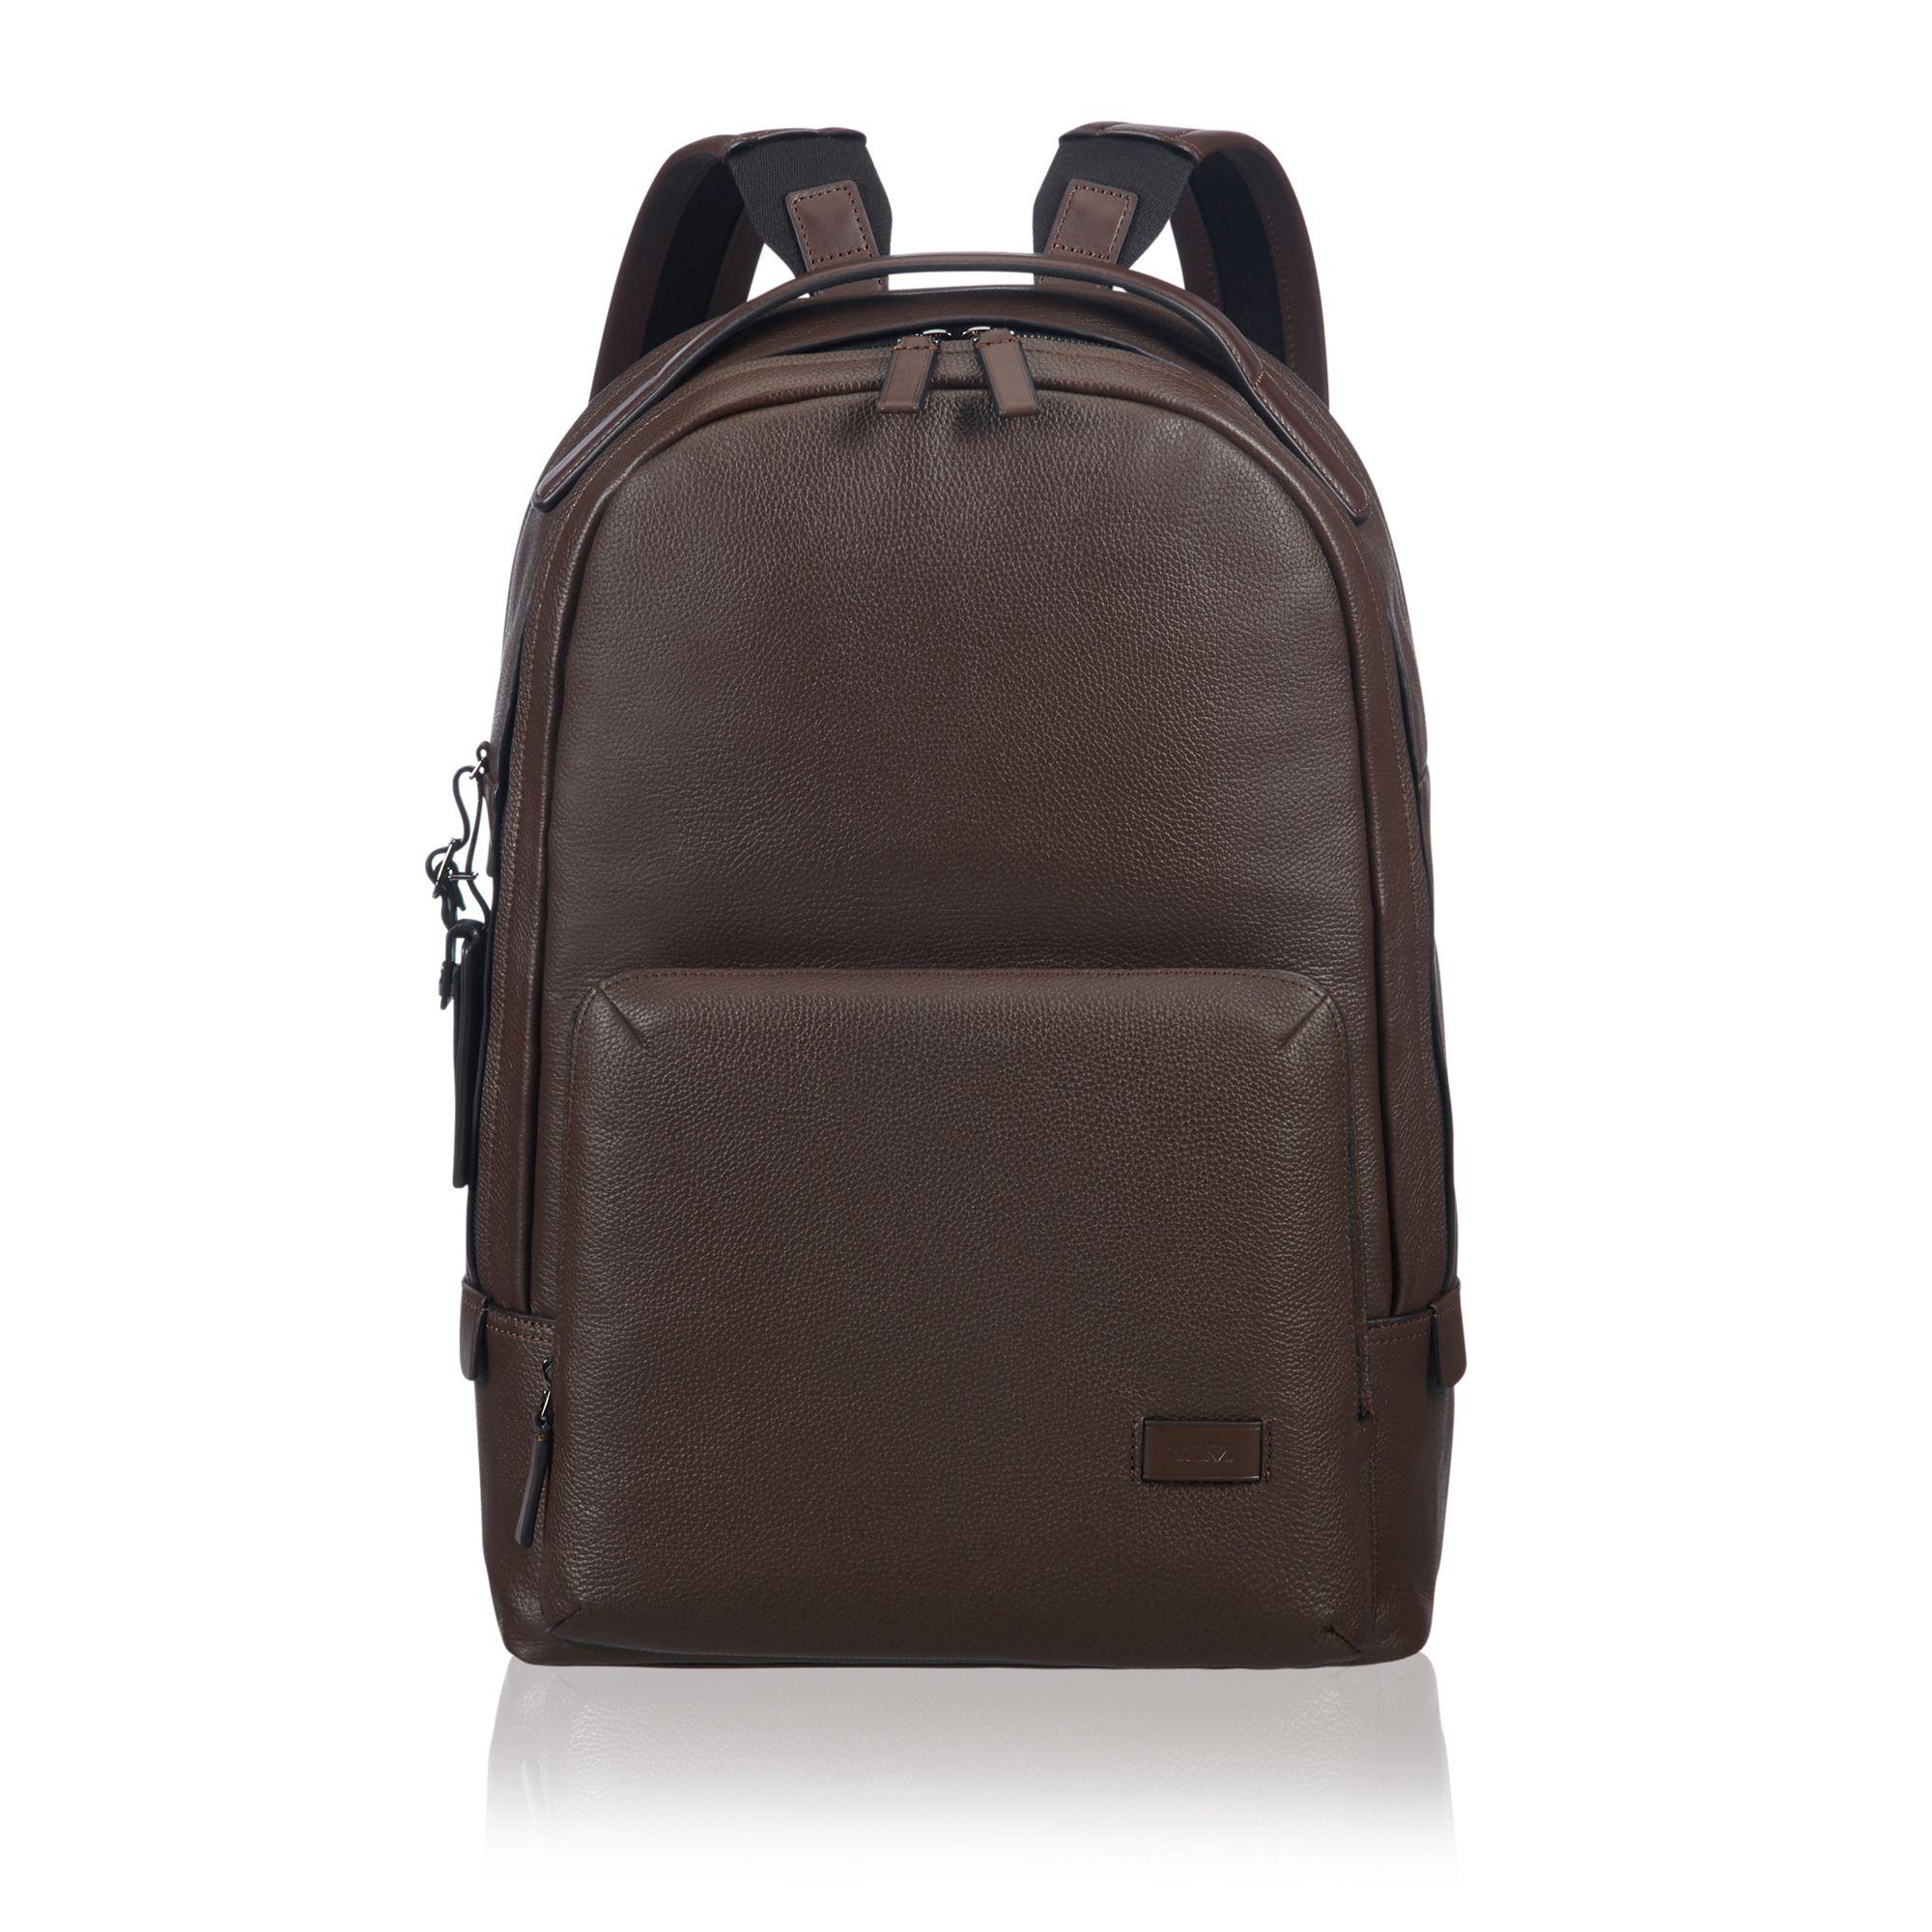 Leather Backpacks & Sling Bags - Tumi United States